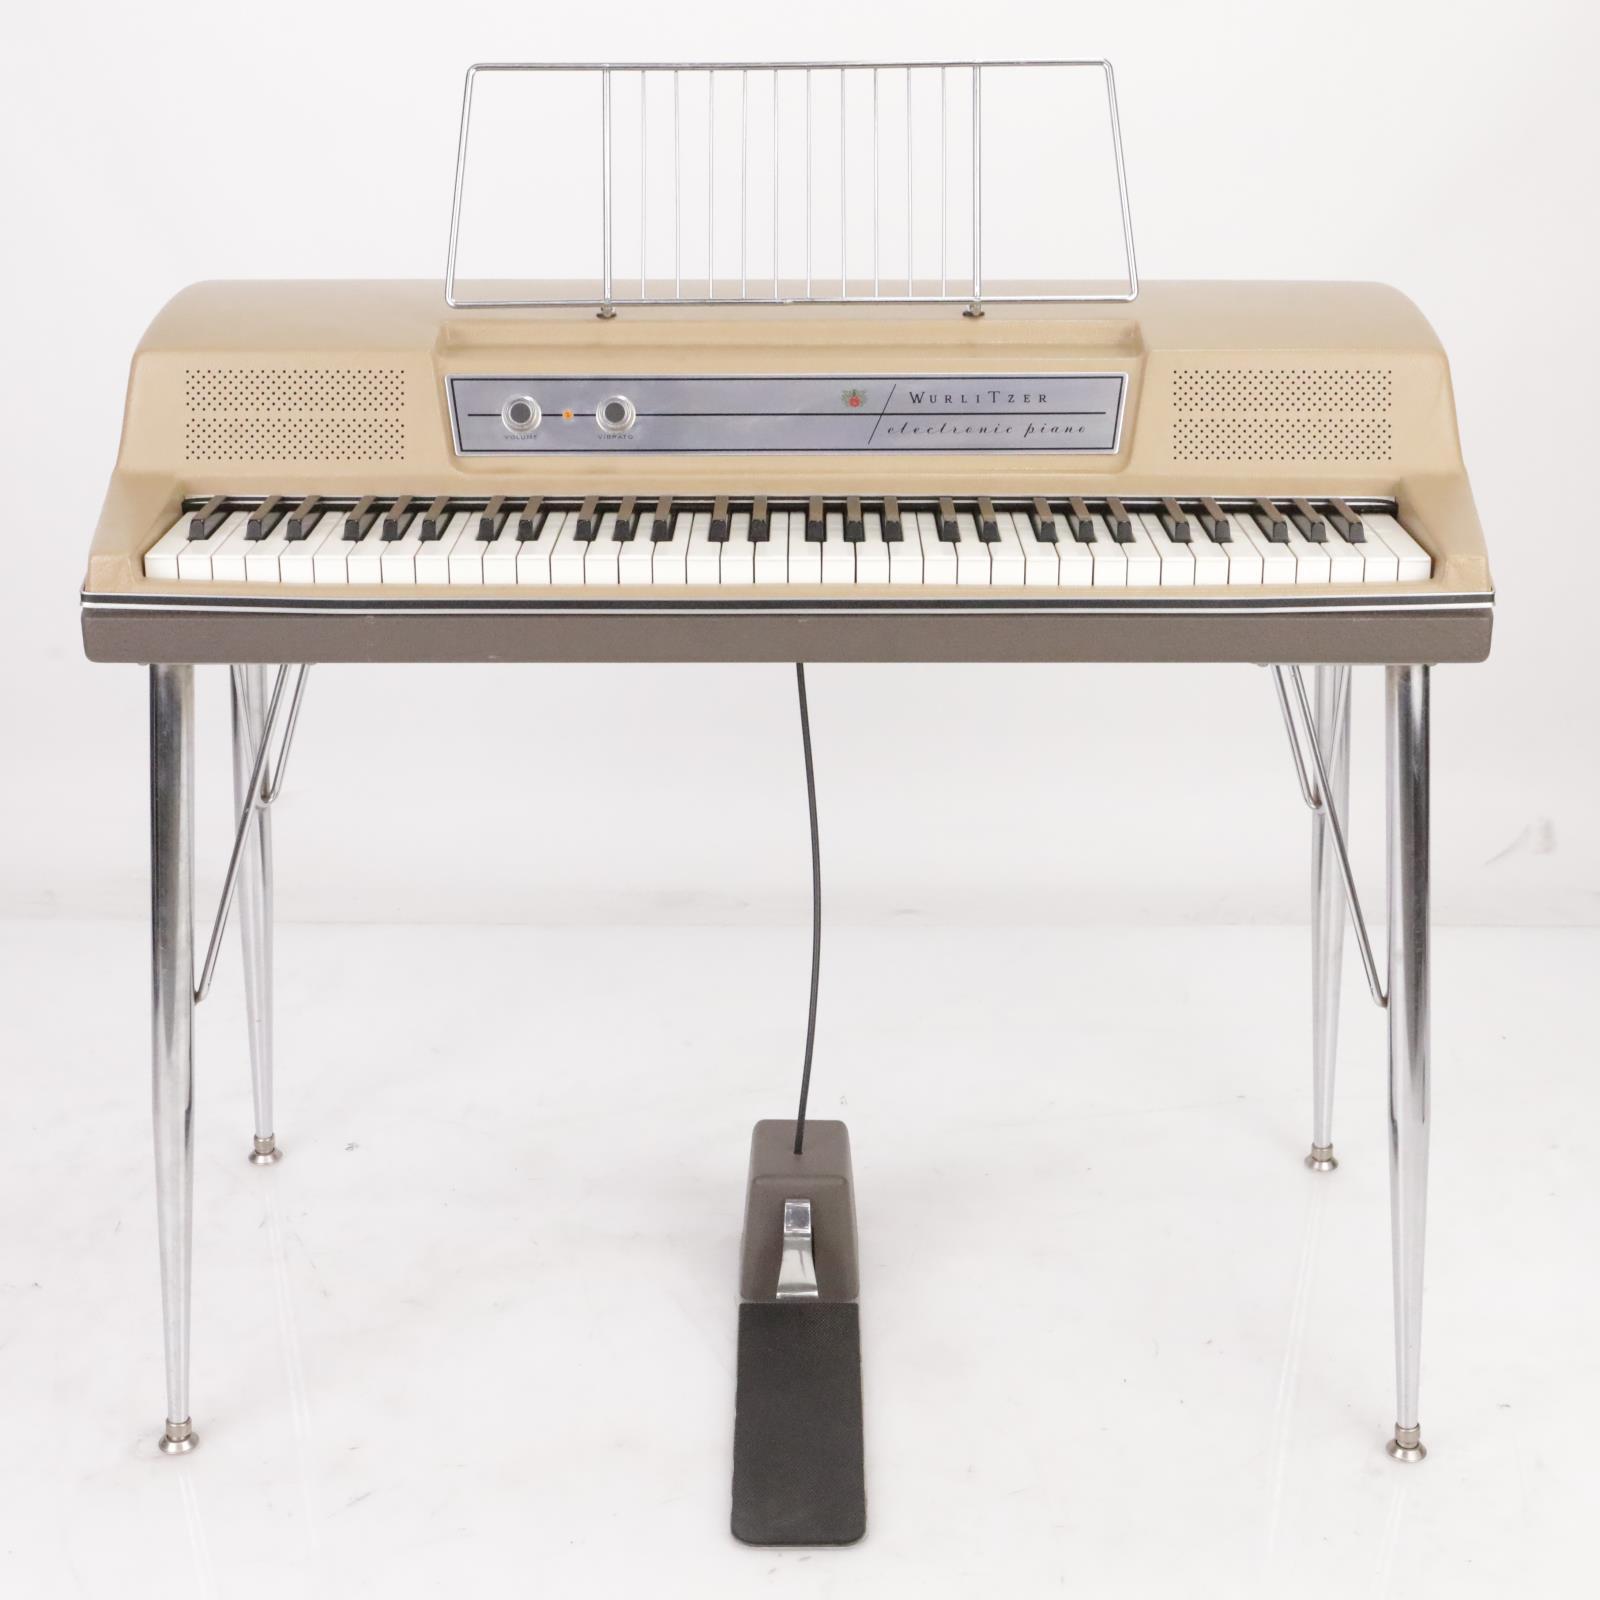 Wurlitzer 200 Electronic Electric Piano w/Legs & Cases Museum Piece! #39143